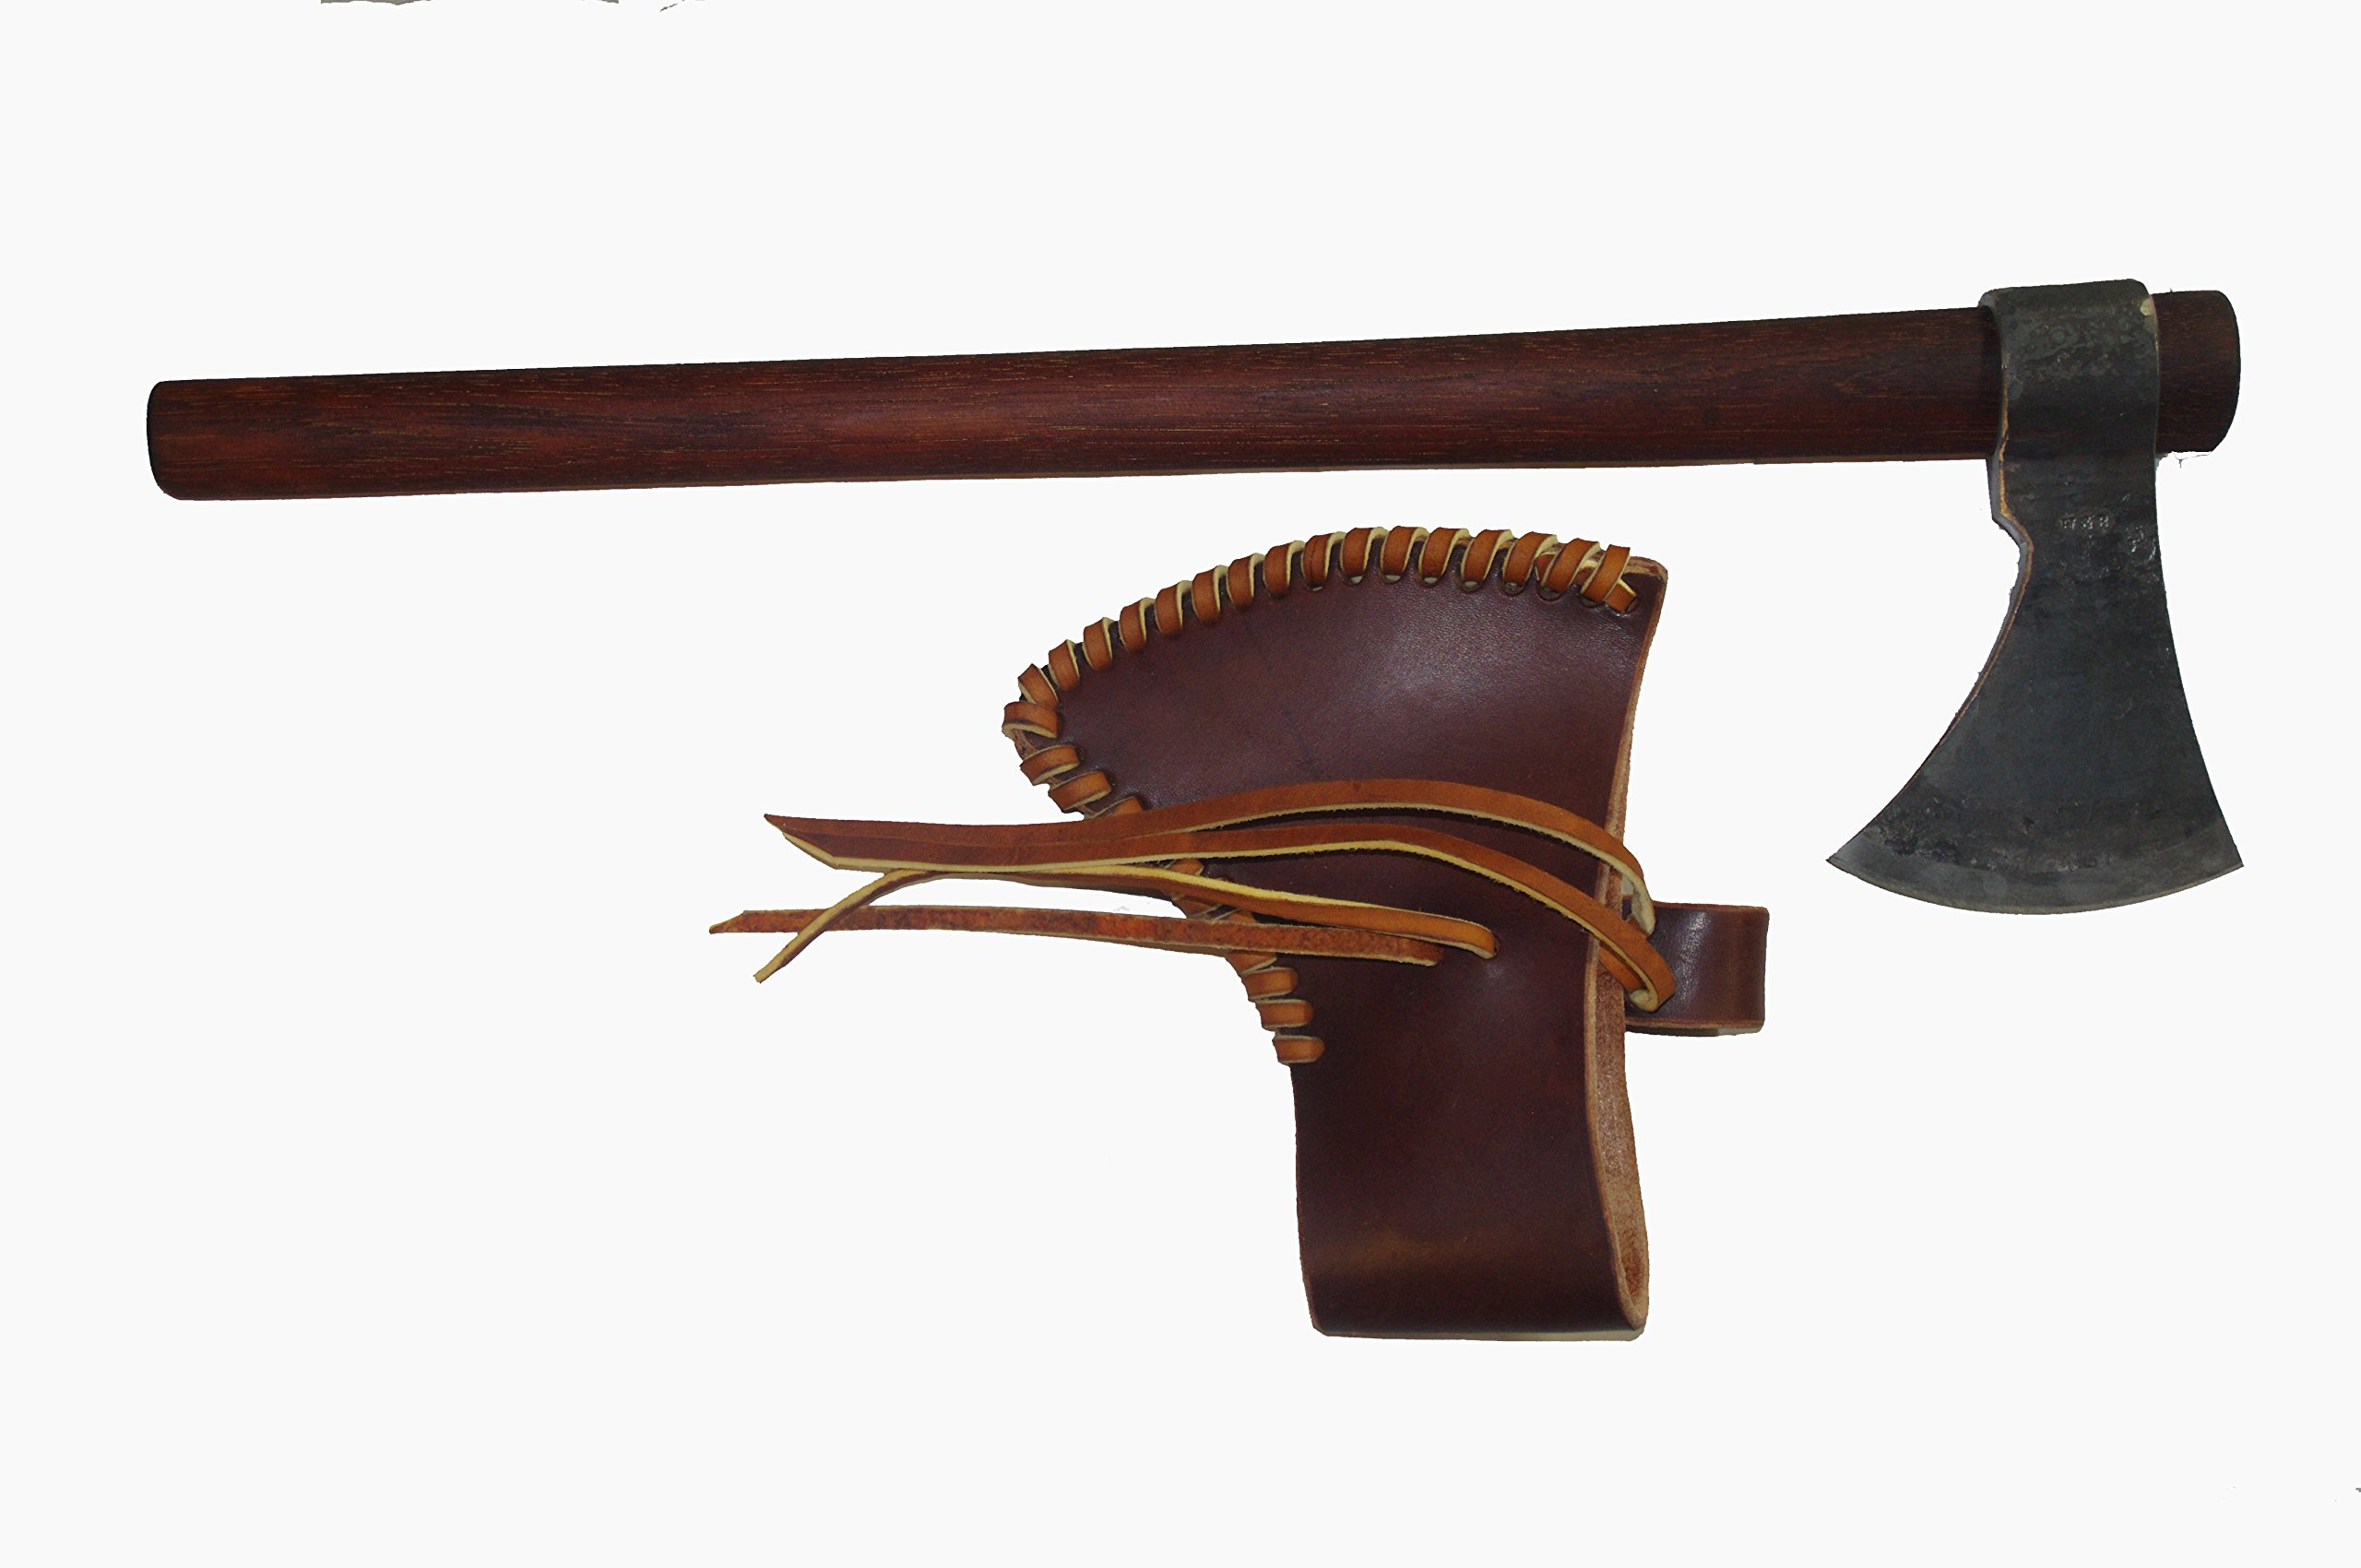 hbforge Hand Forged Shawnee Throwing Tomahawk